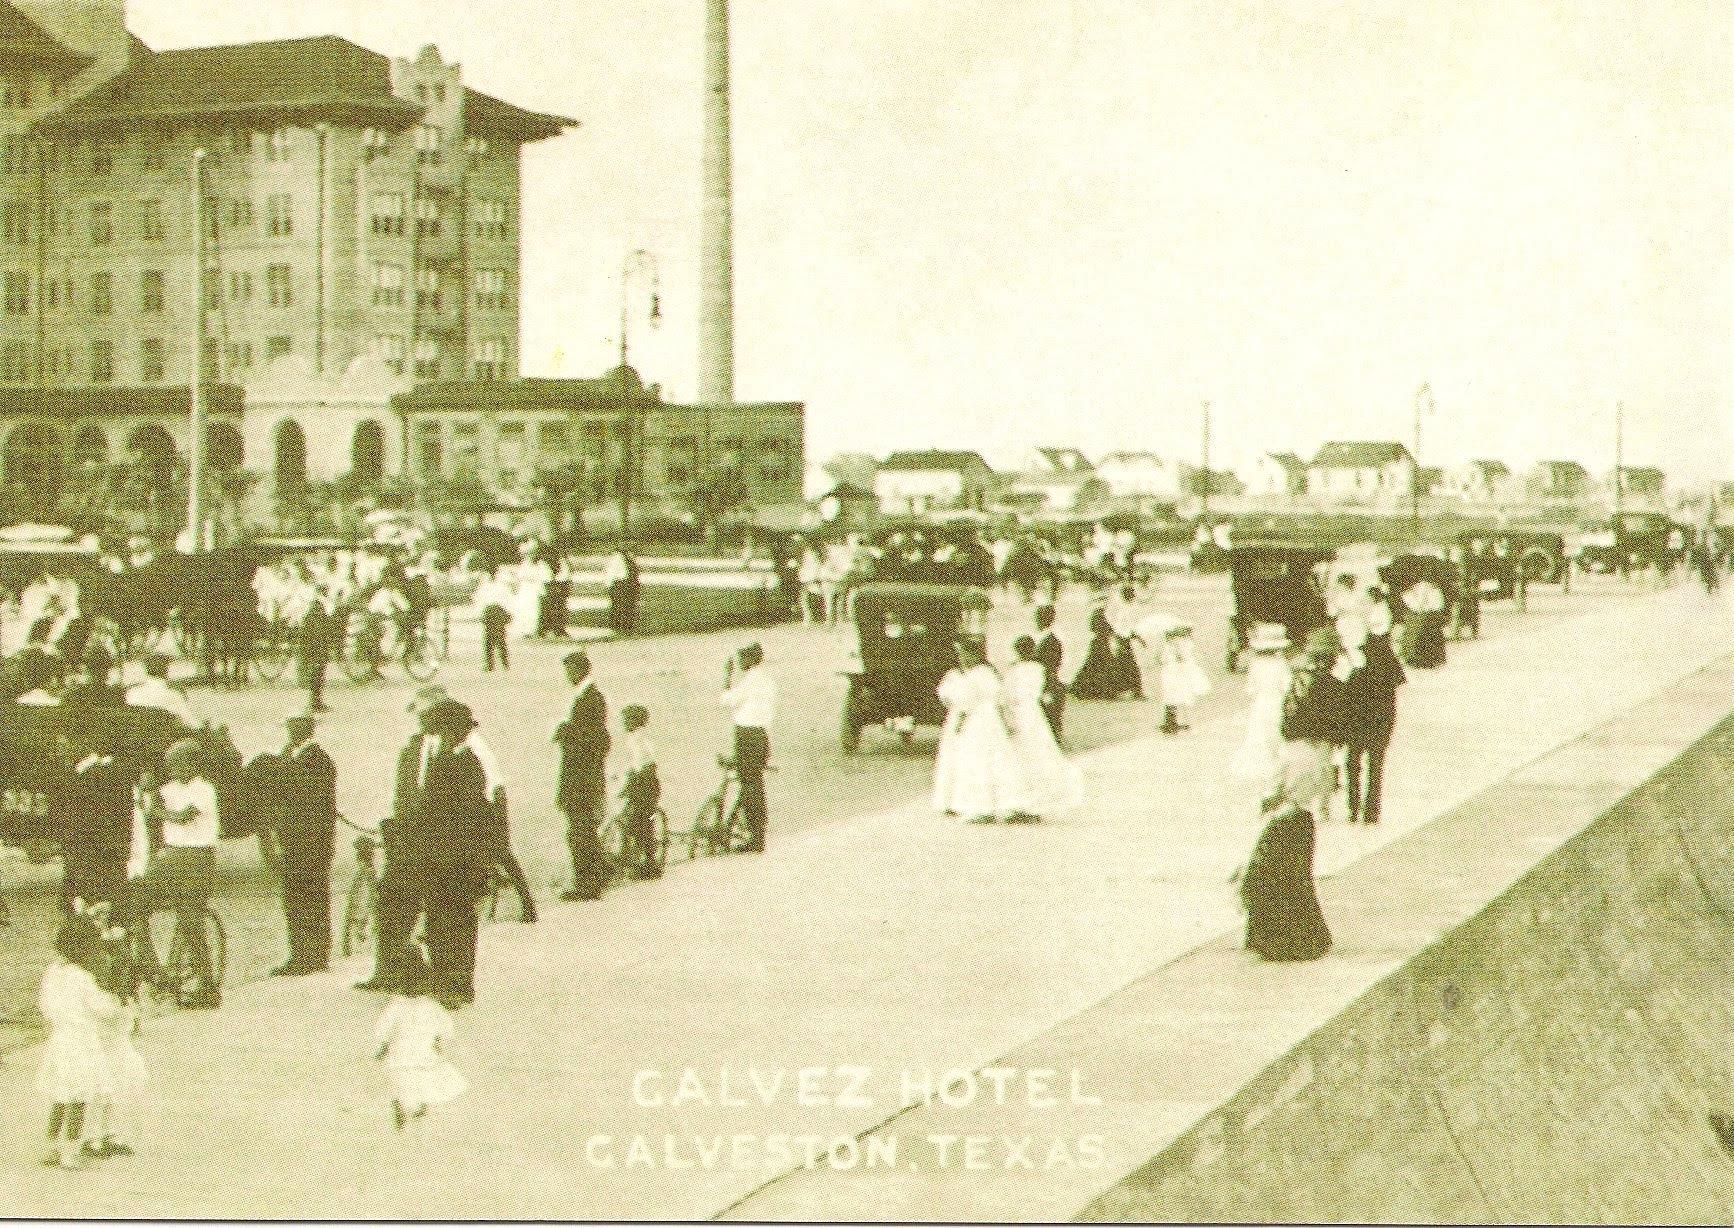 Galvez Hotel: Reproduction of Vintage Postcard.